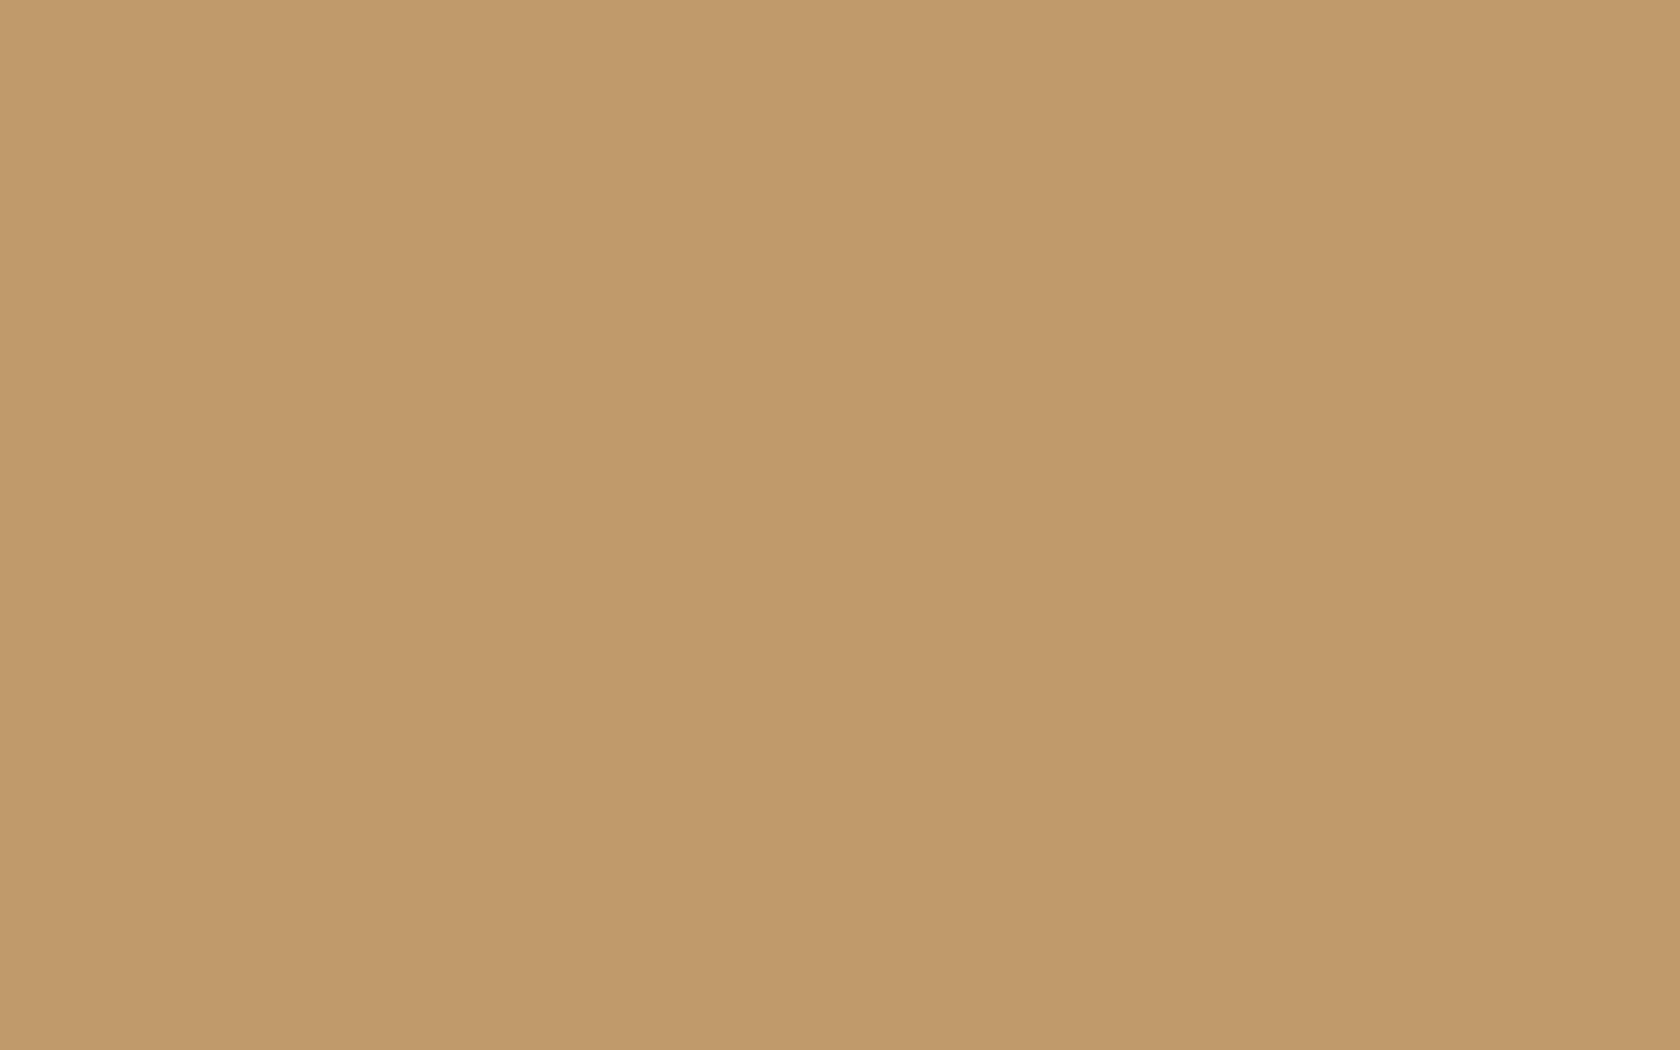 1680x1050 Desert Solid Color Background